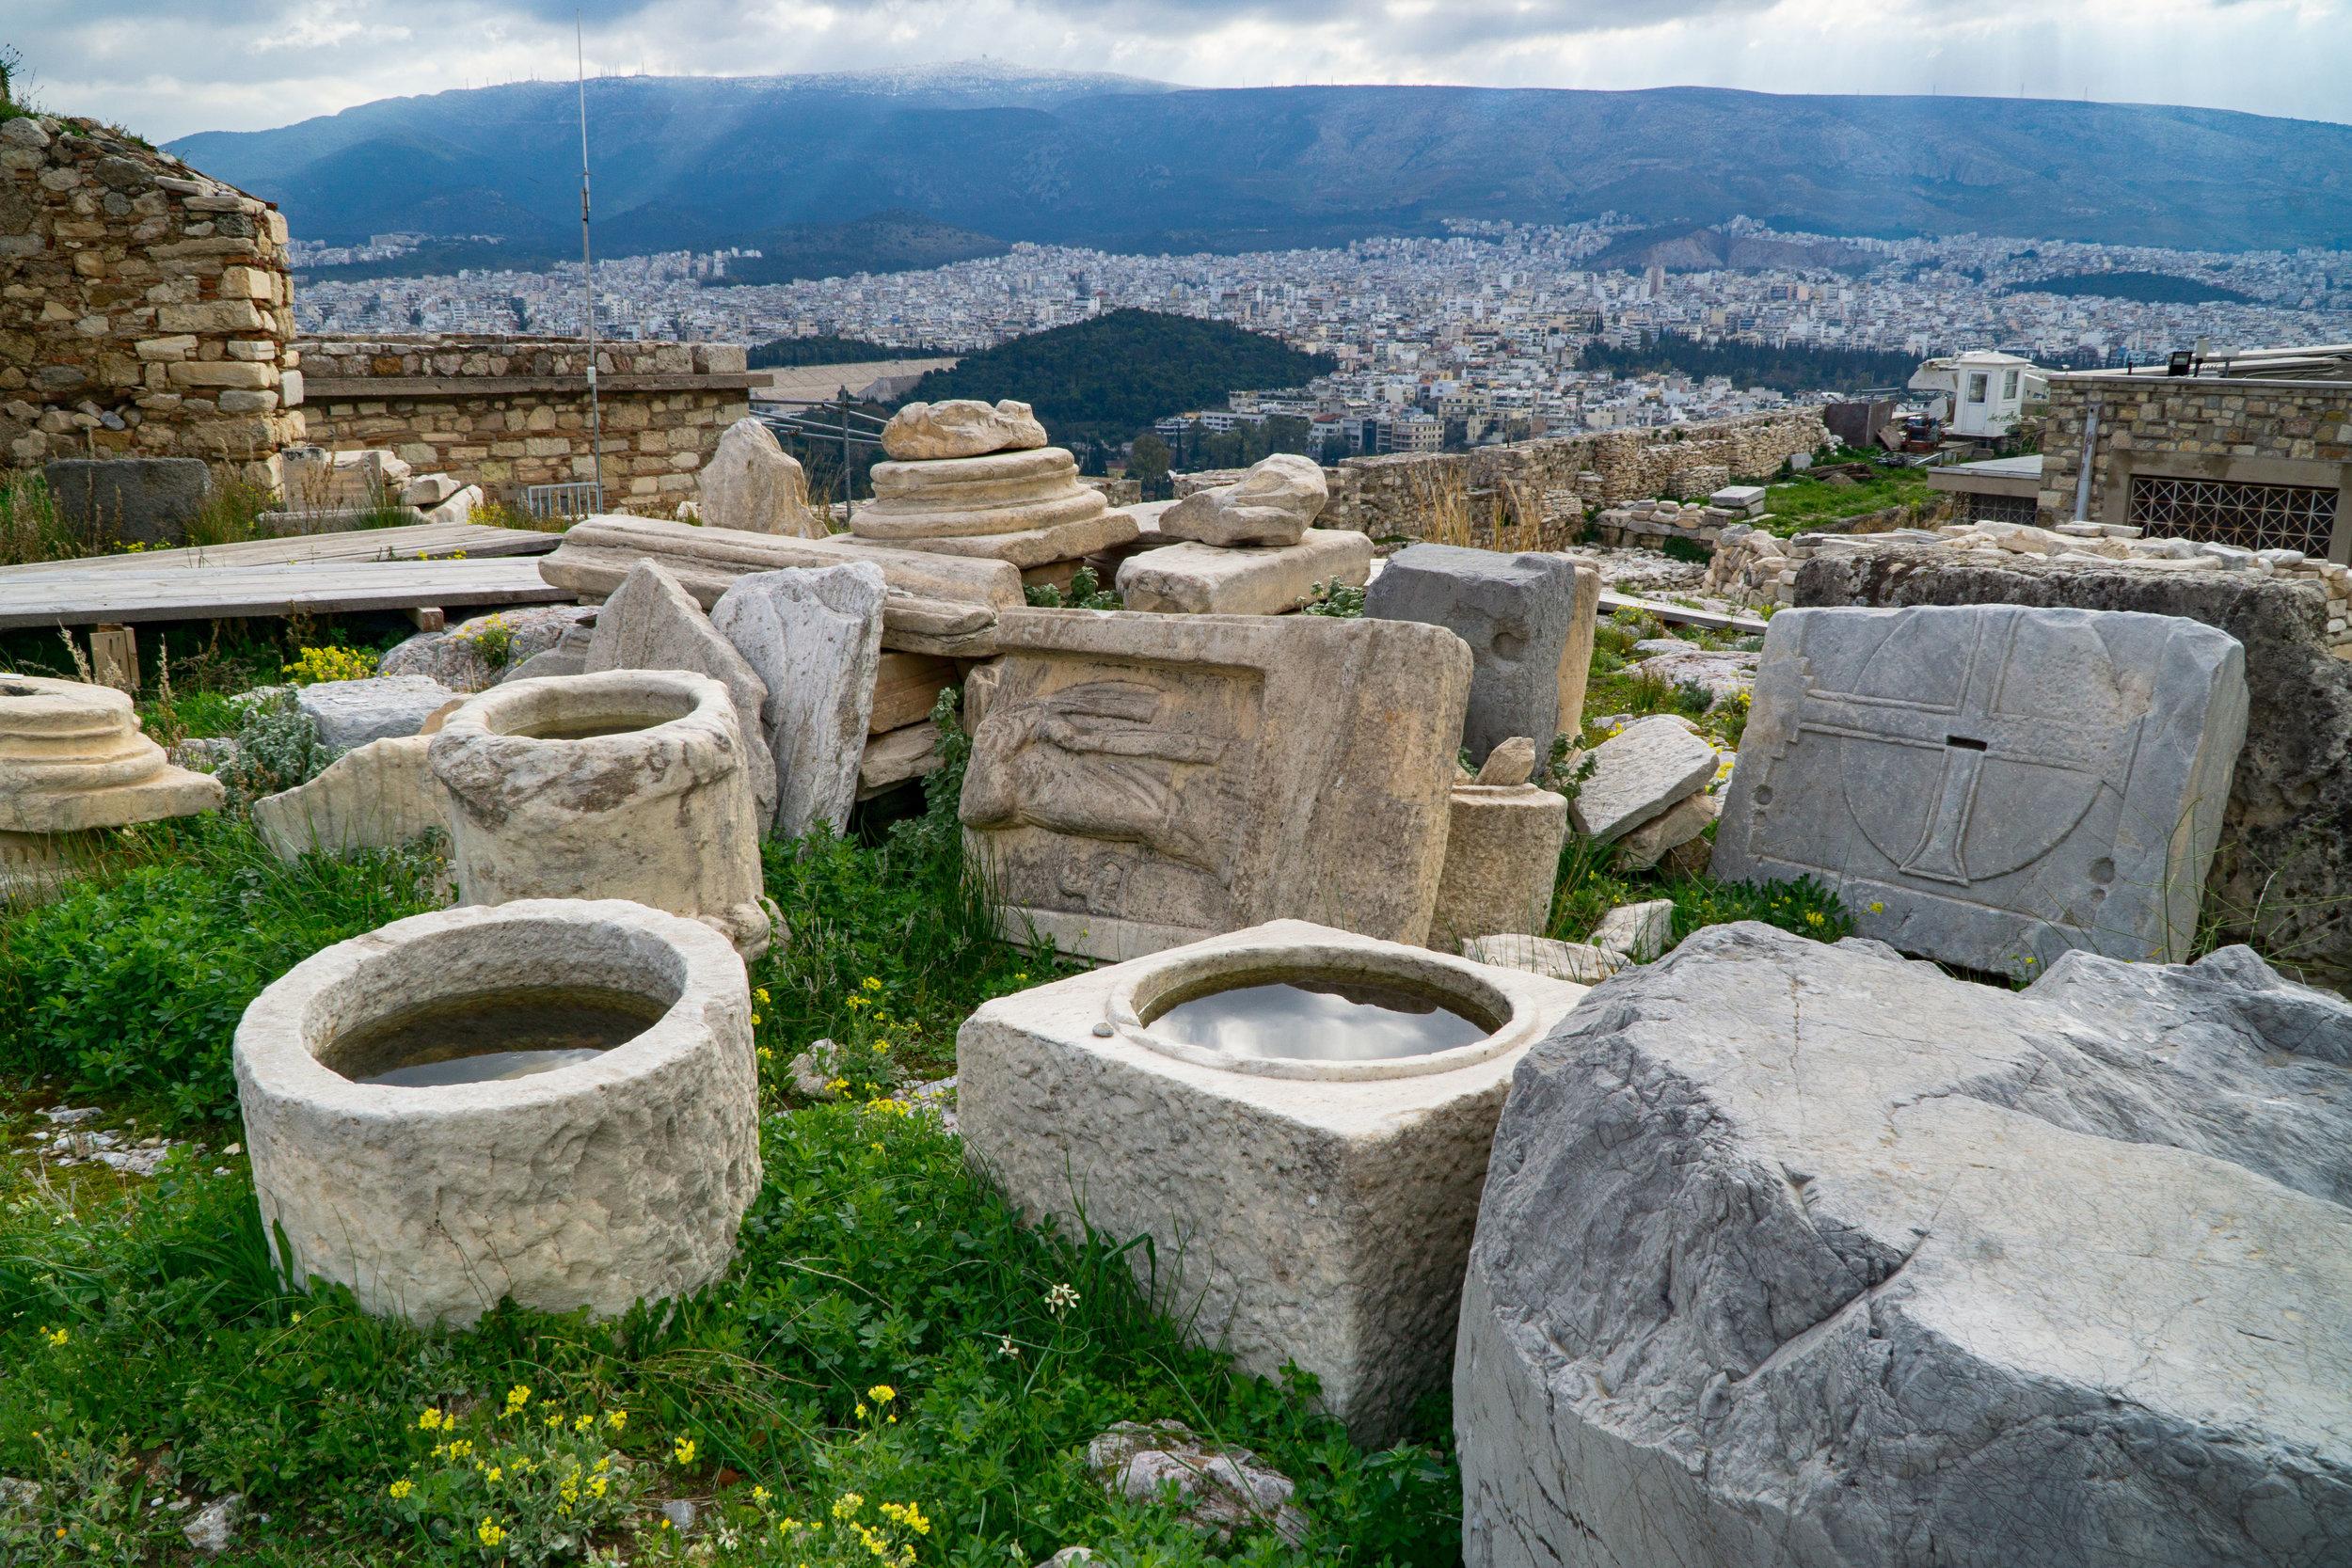 athens_acropolis_vickygood_travel_photography10sm.jpg